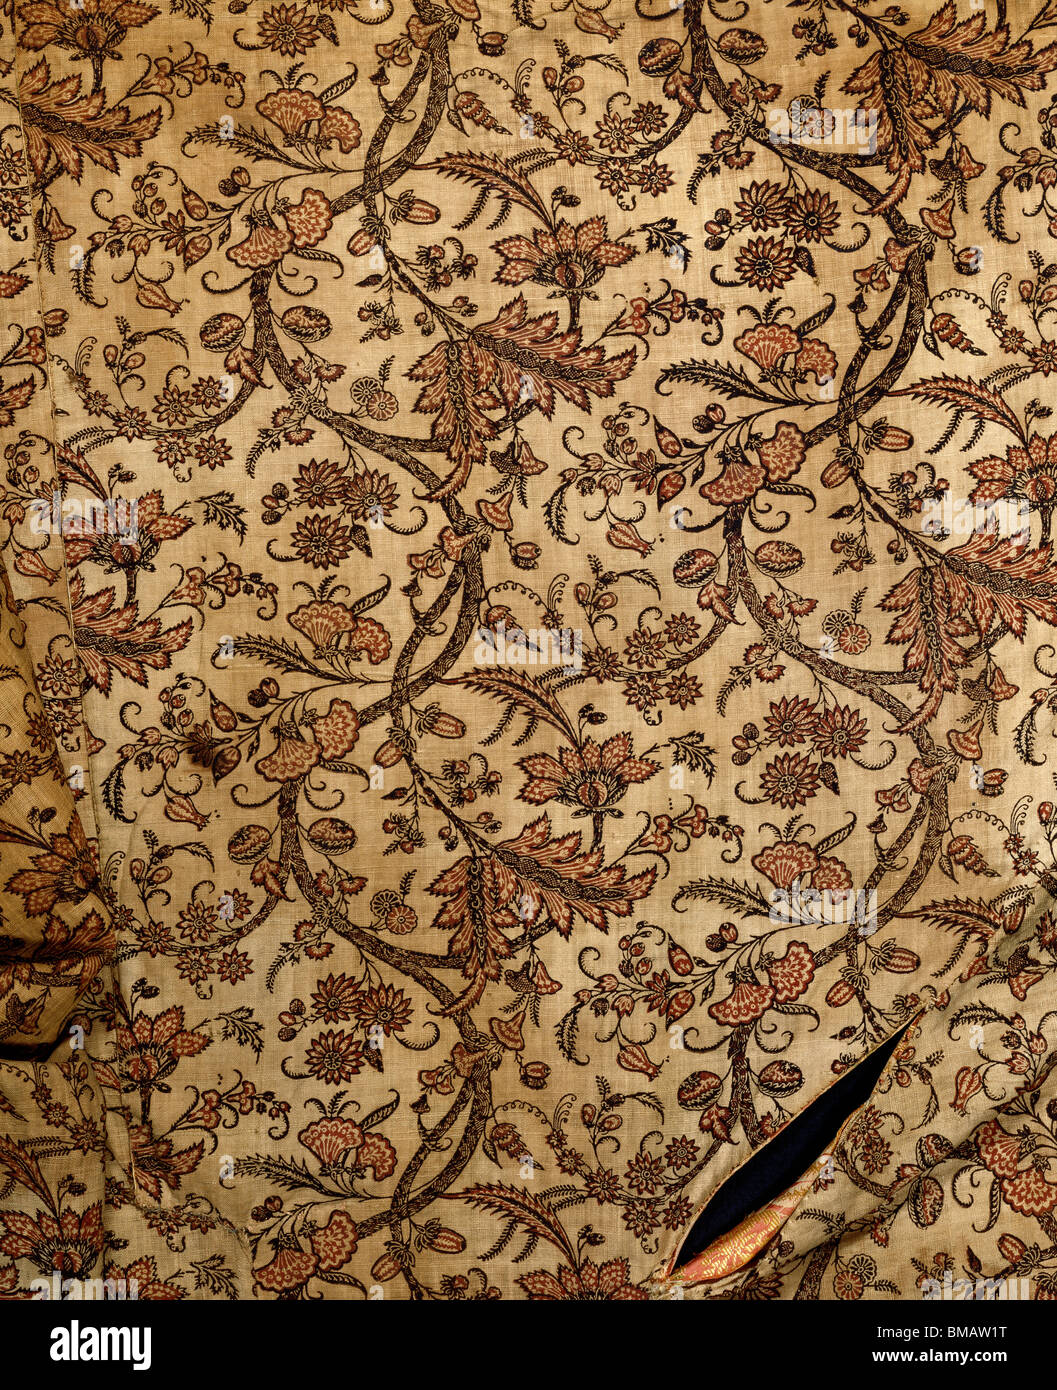 Banyan. Inghilterra, XVIII secolo Immagini Stock